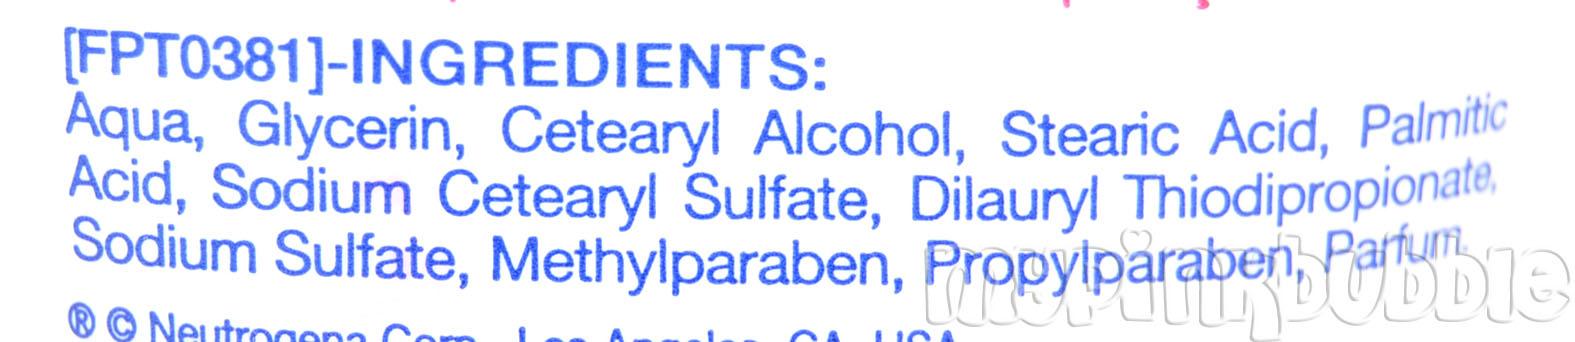 crema manos Neutrogena ingredientes